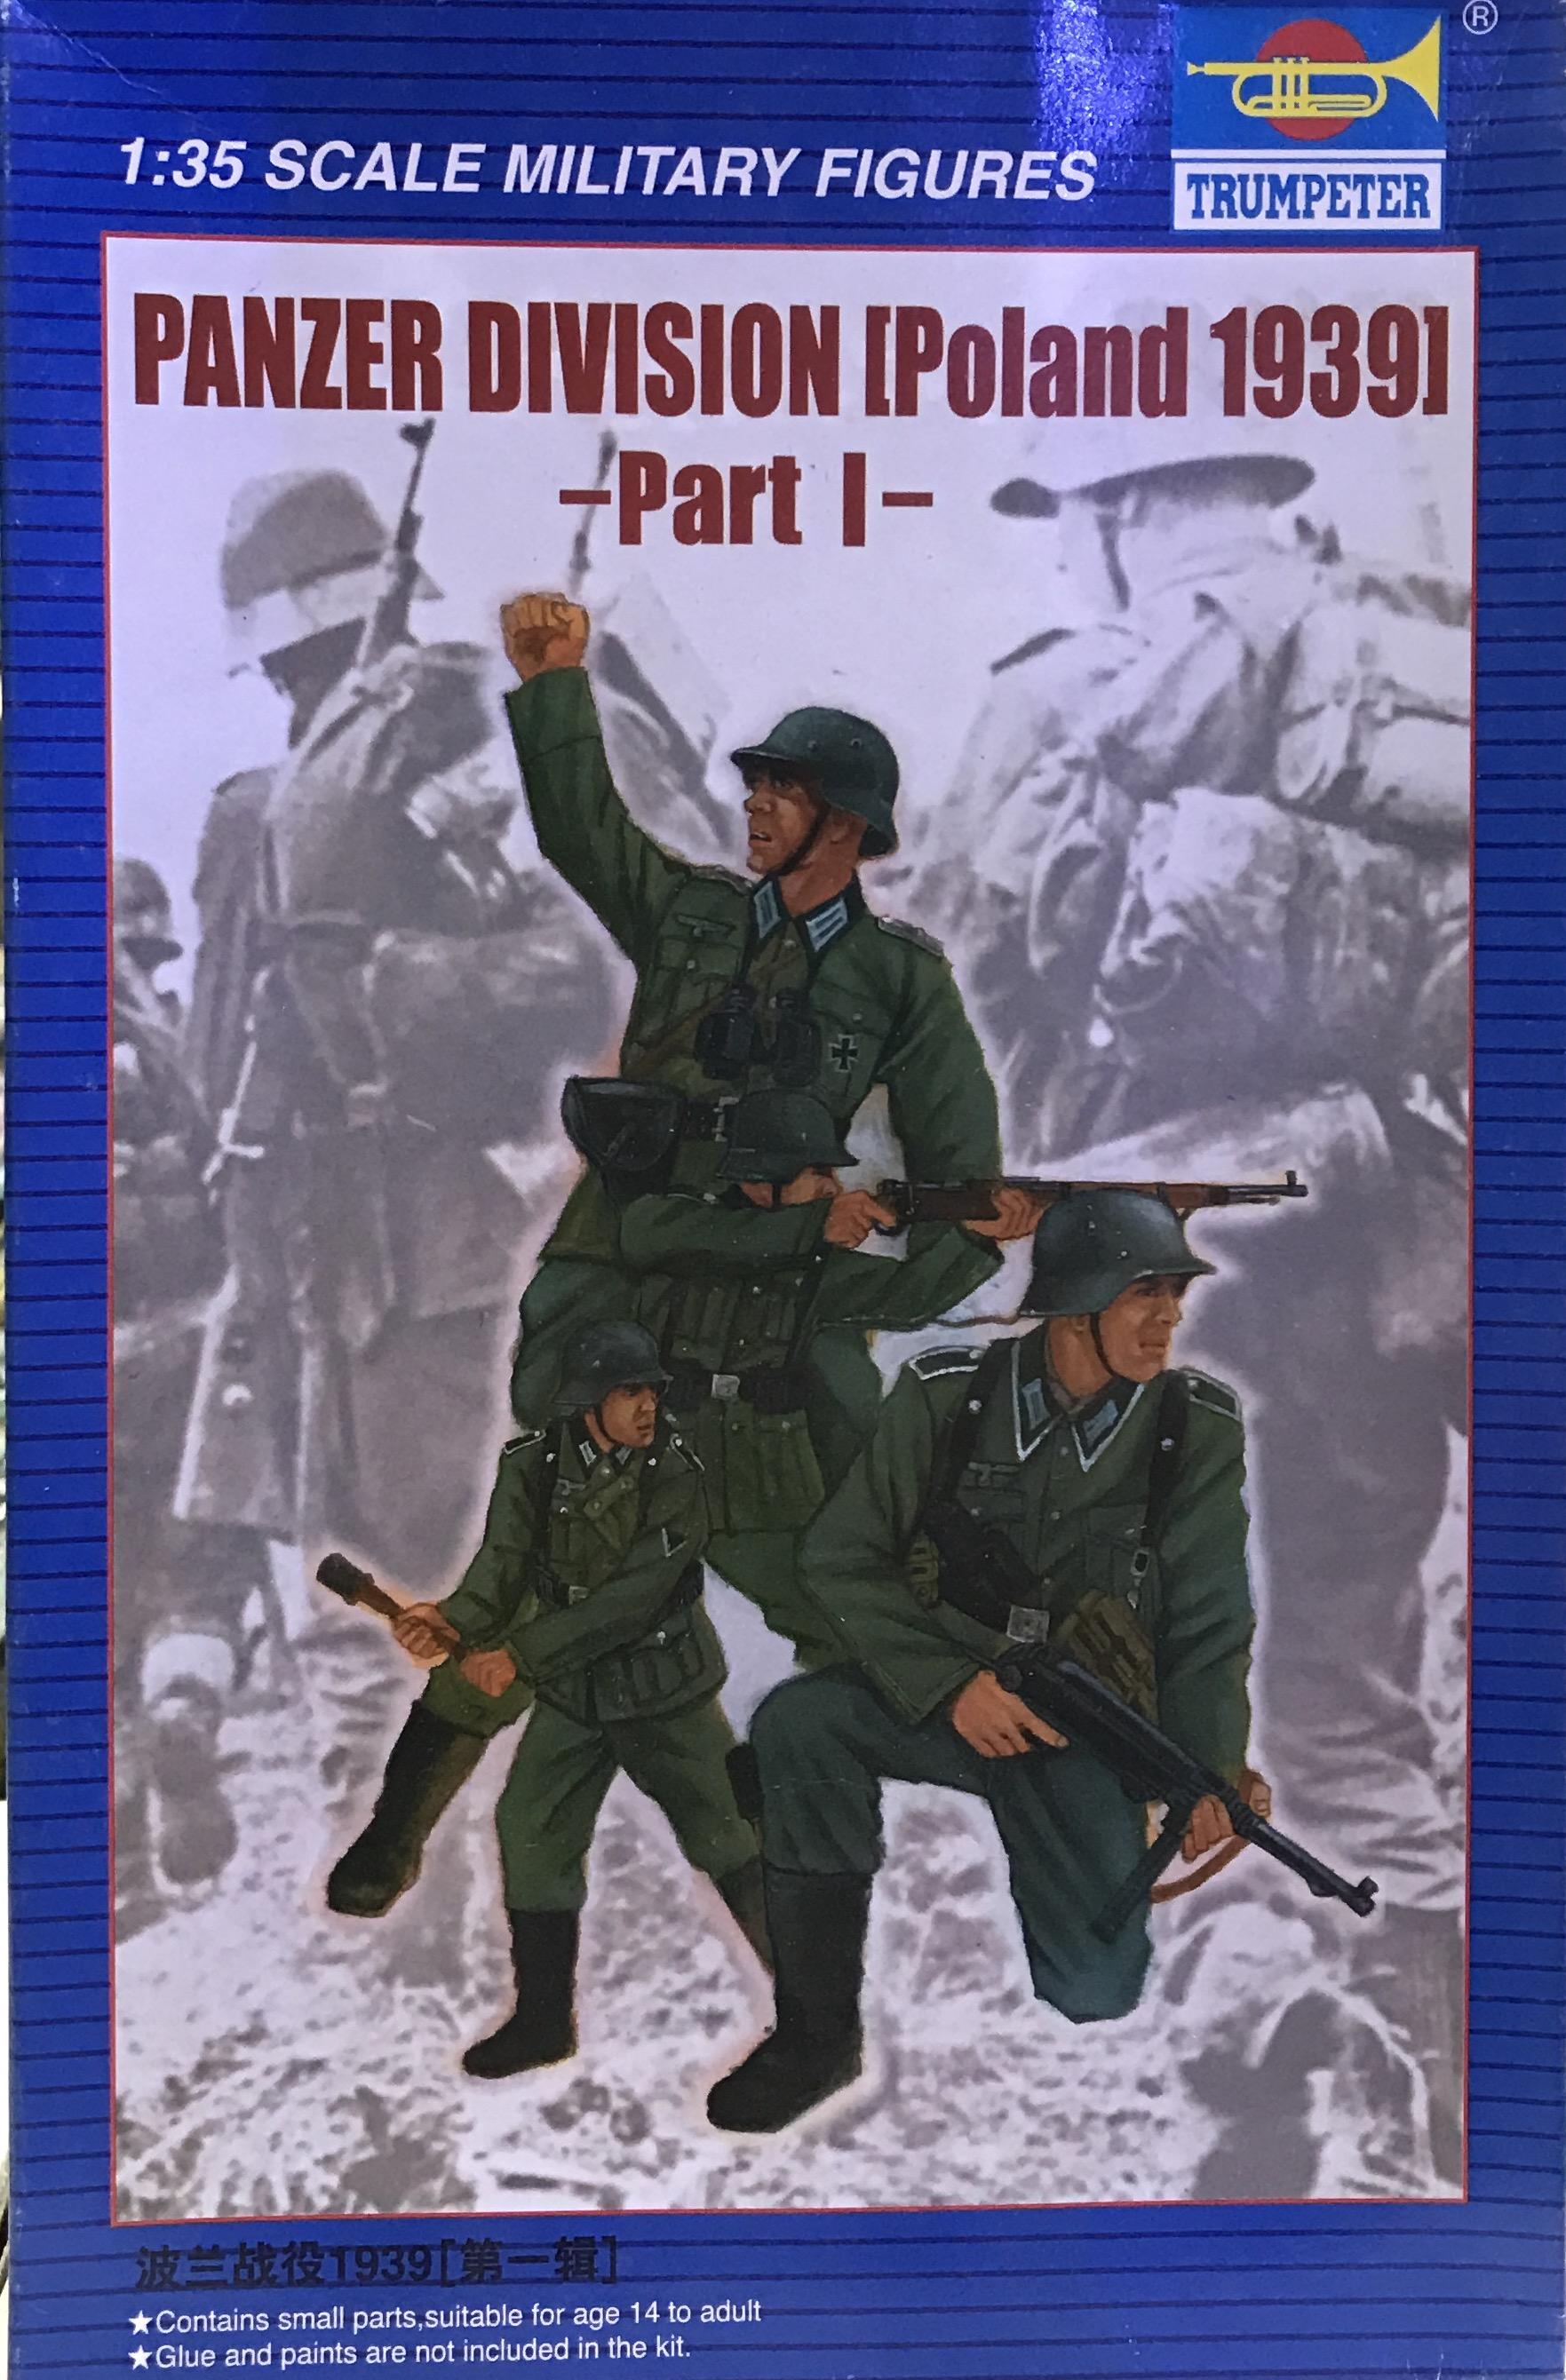 1/35 Panzer Divsion Poland 1939 Part I [Trumpeter]